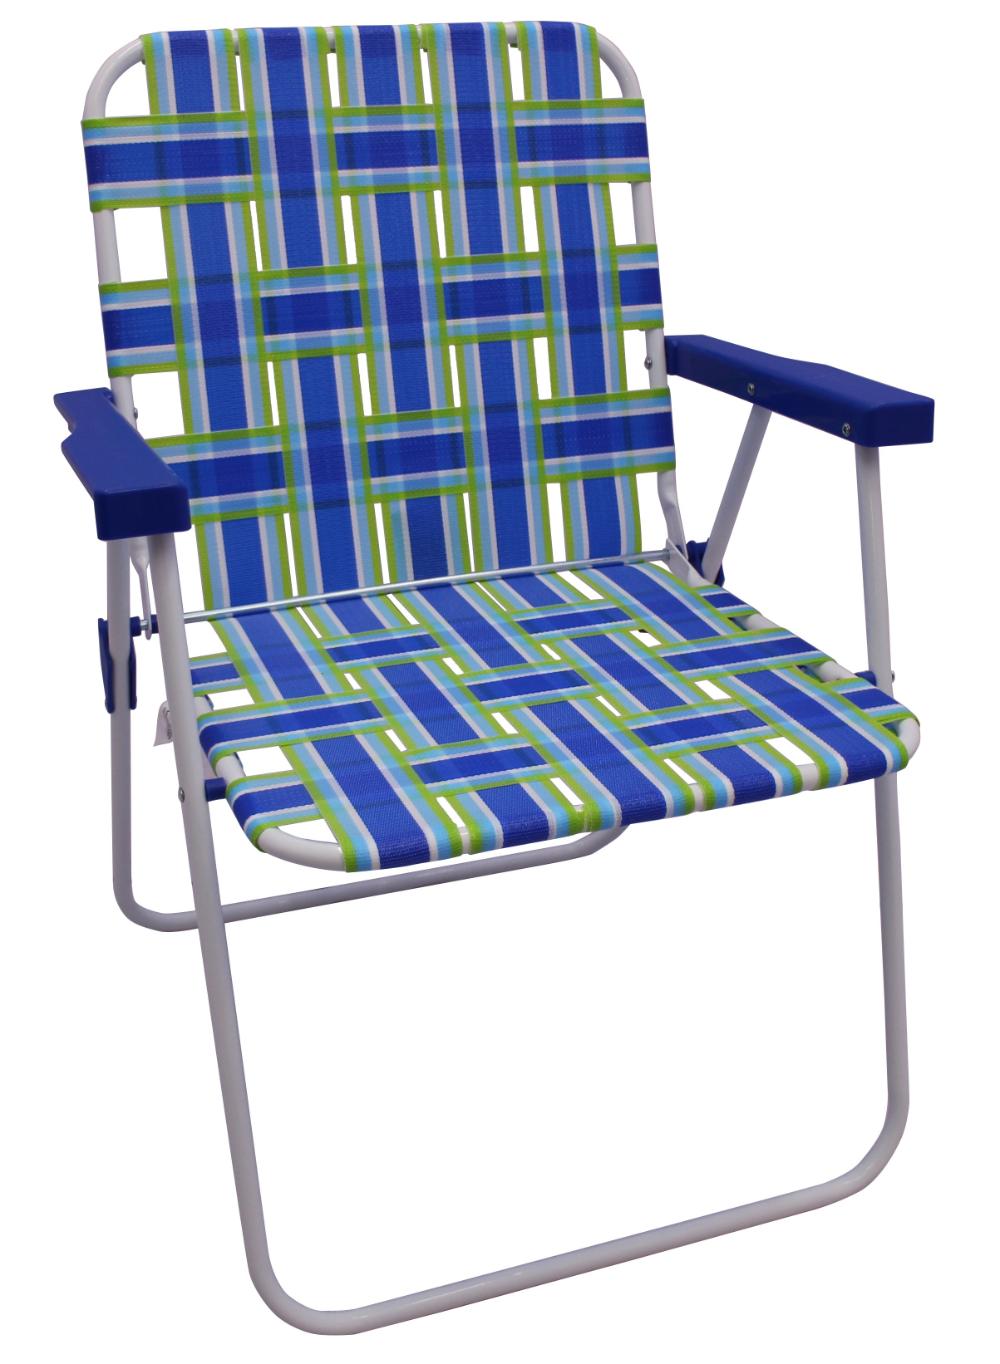 Mainstays Folding Blue & Green Stripe Beach Web Chair